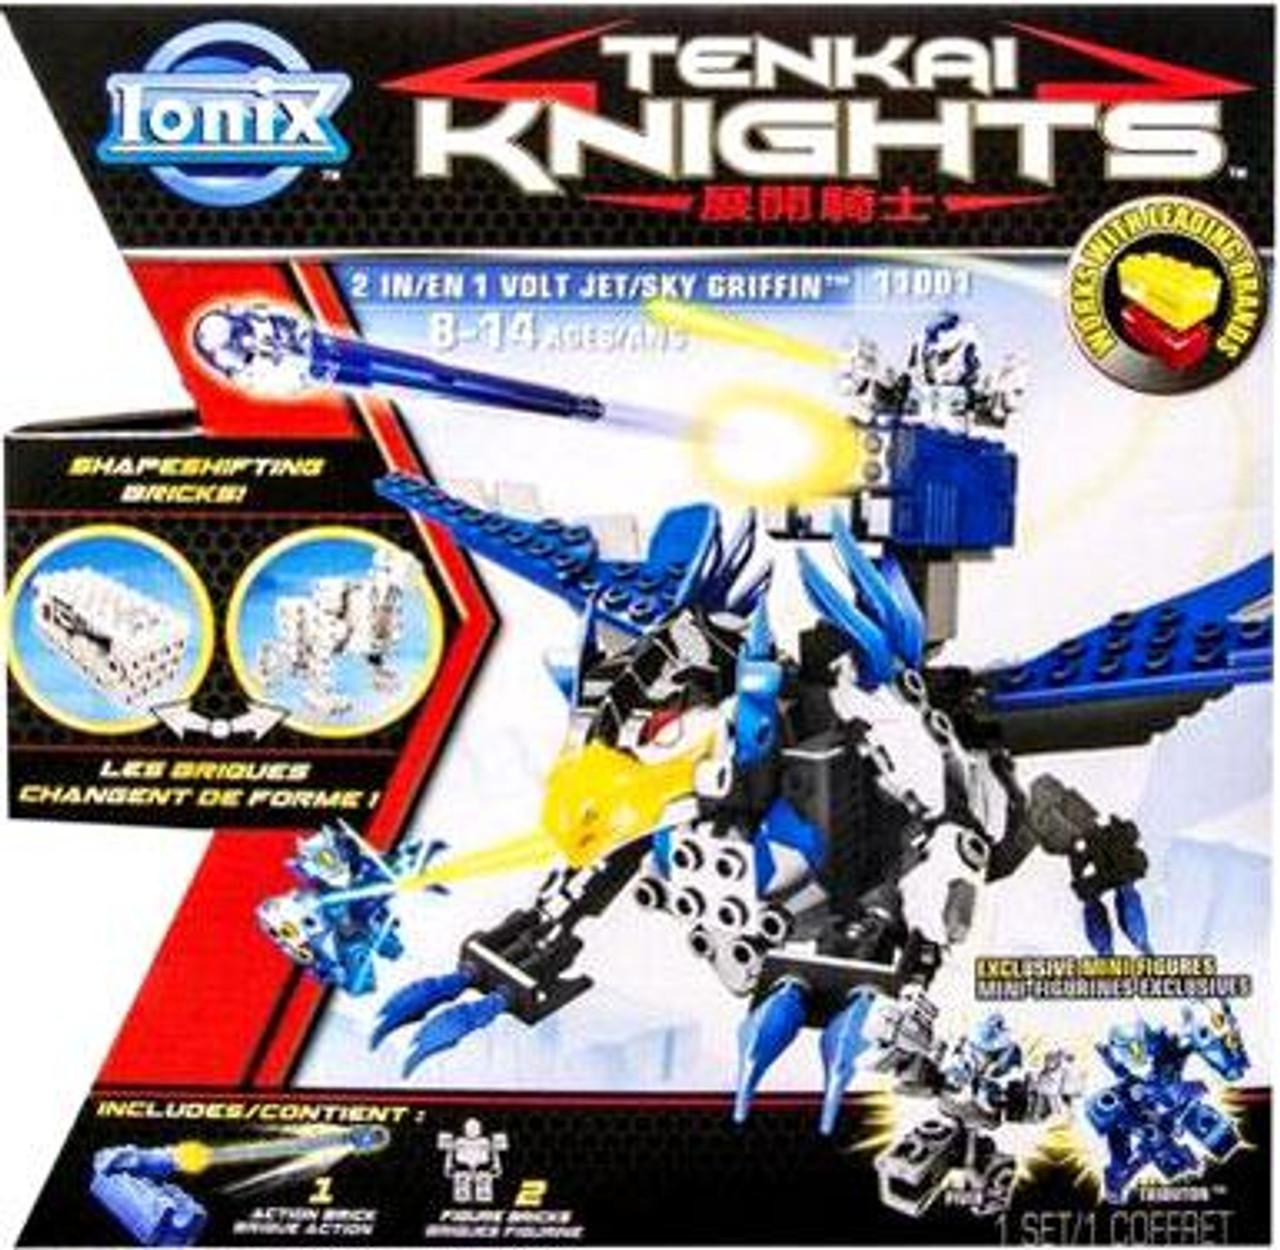 Tenkai Knights Volt Jet / Sky Griffin Set #11001